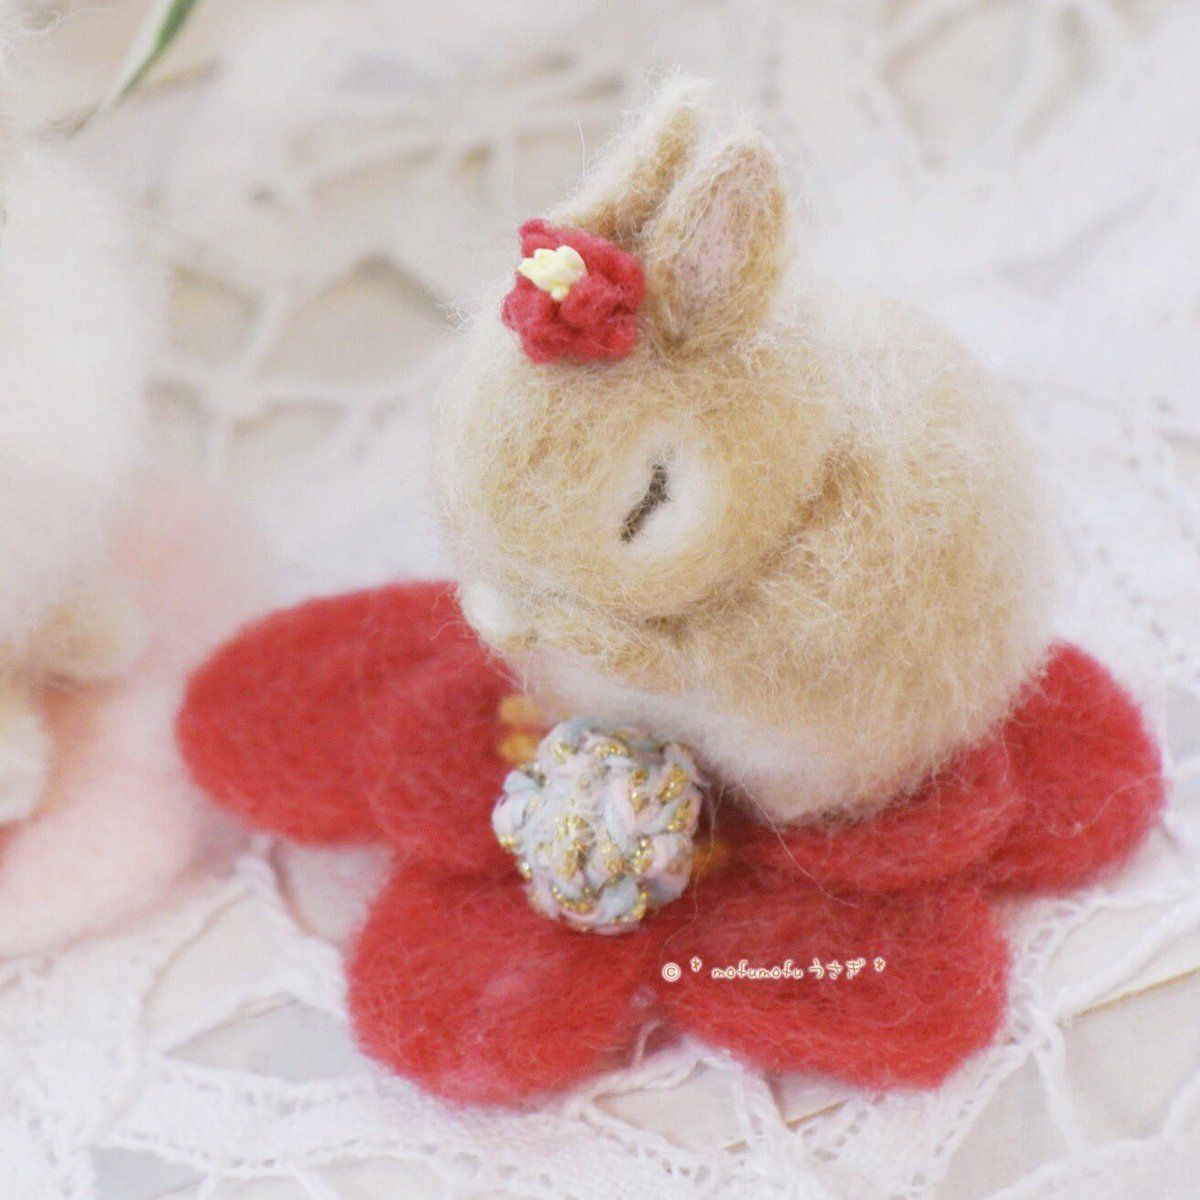 Cocomi 2 3ws ハウスオブラビット Coco Mirumiru Twitter Teddy Coco Teddy Bear